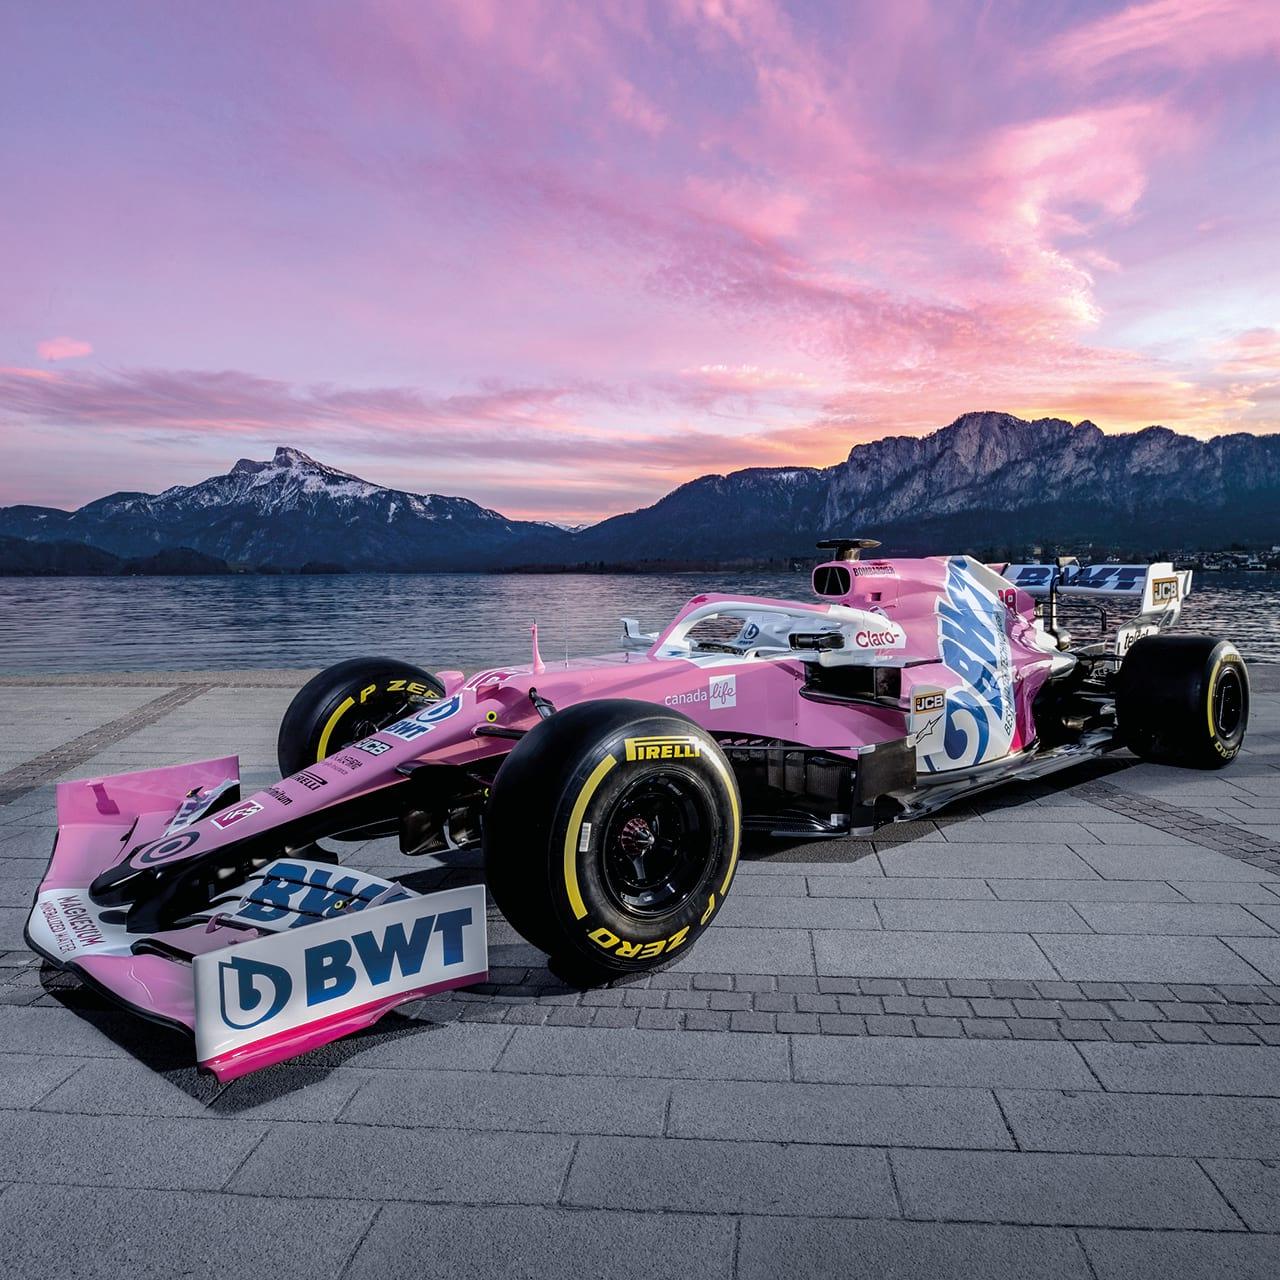 Bwt Formel 1